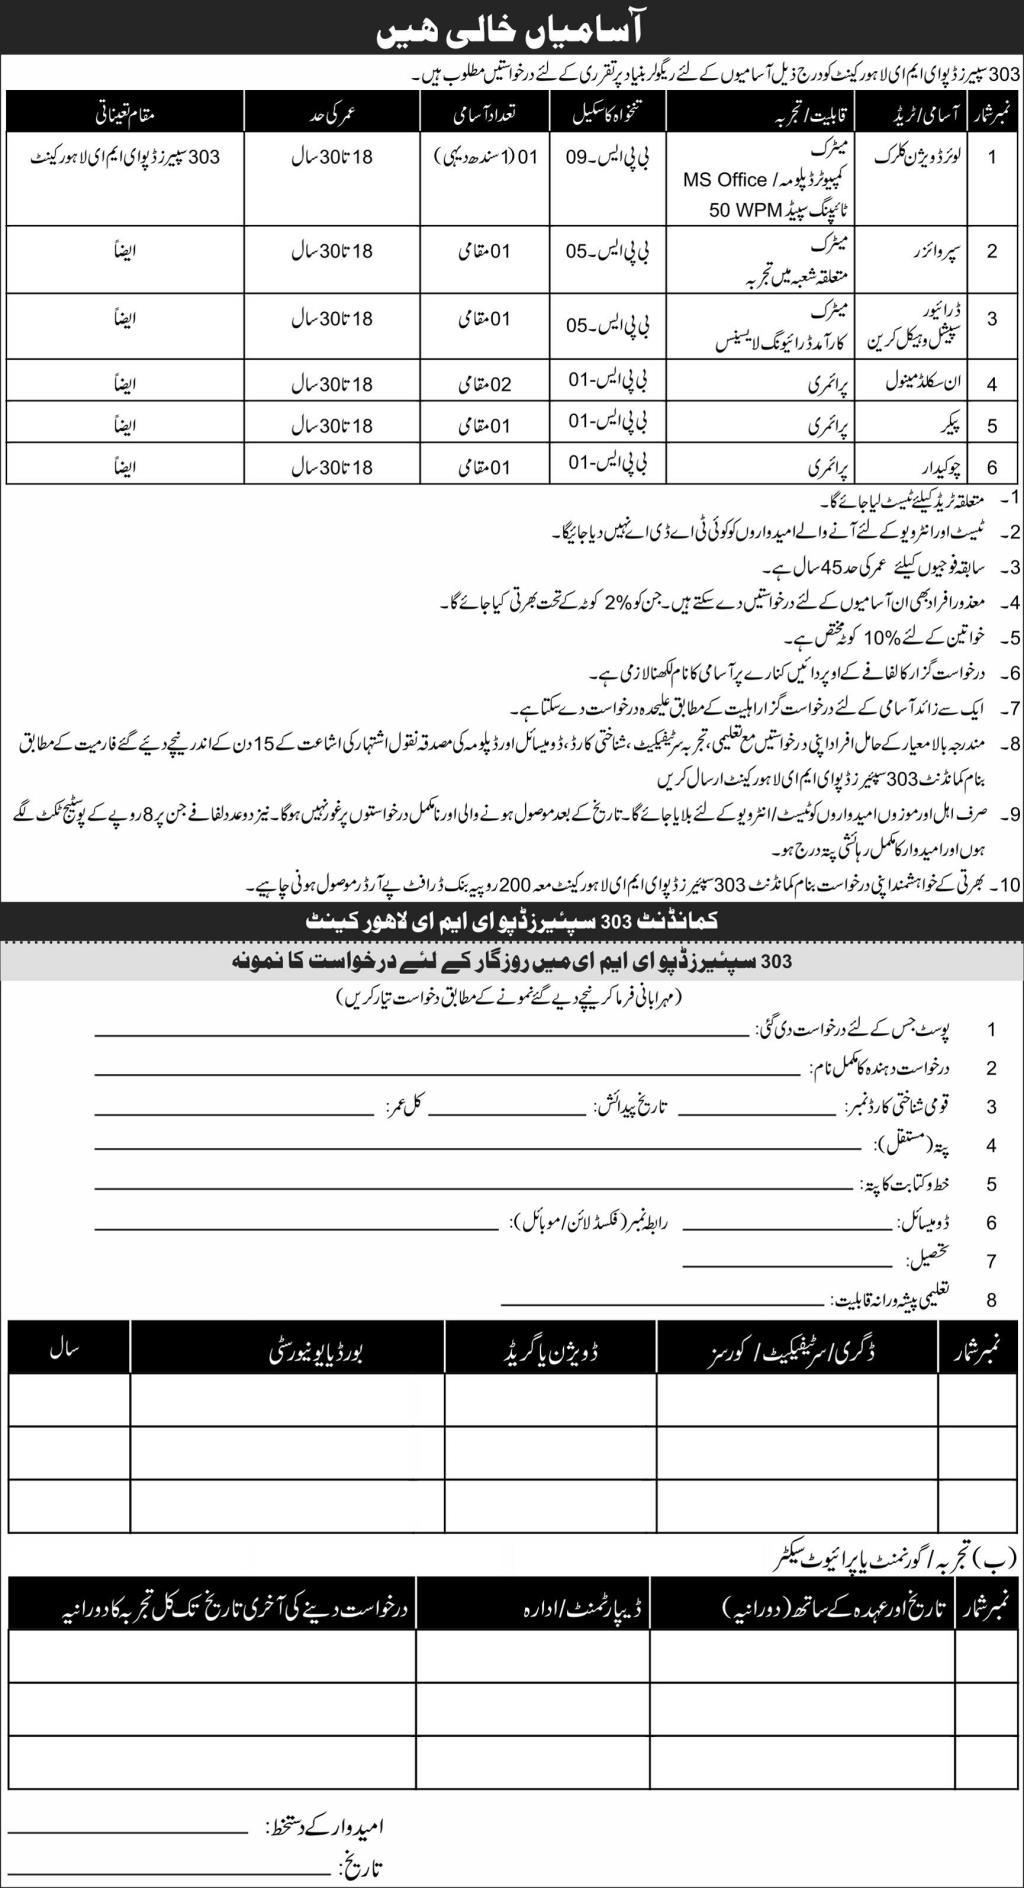 303 Spares Depot EME Lahore Cantt Job 2020